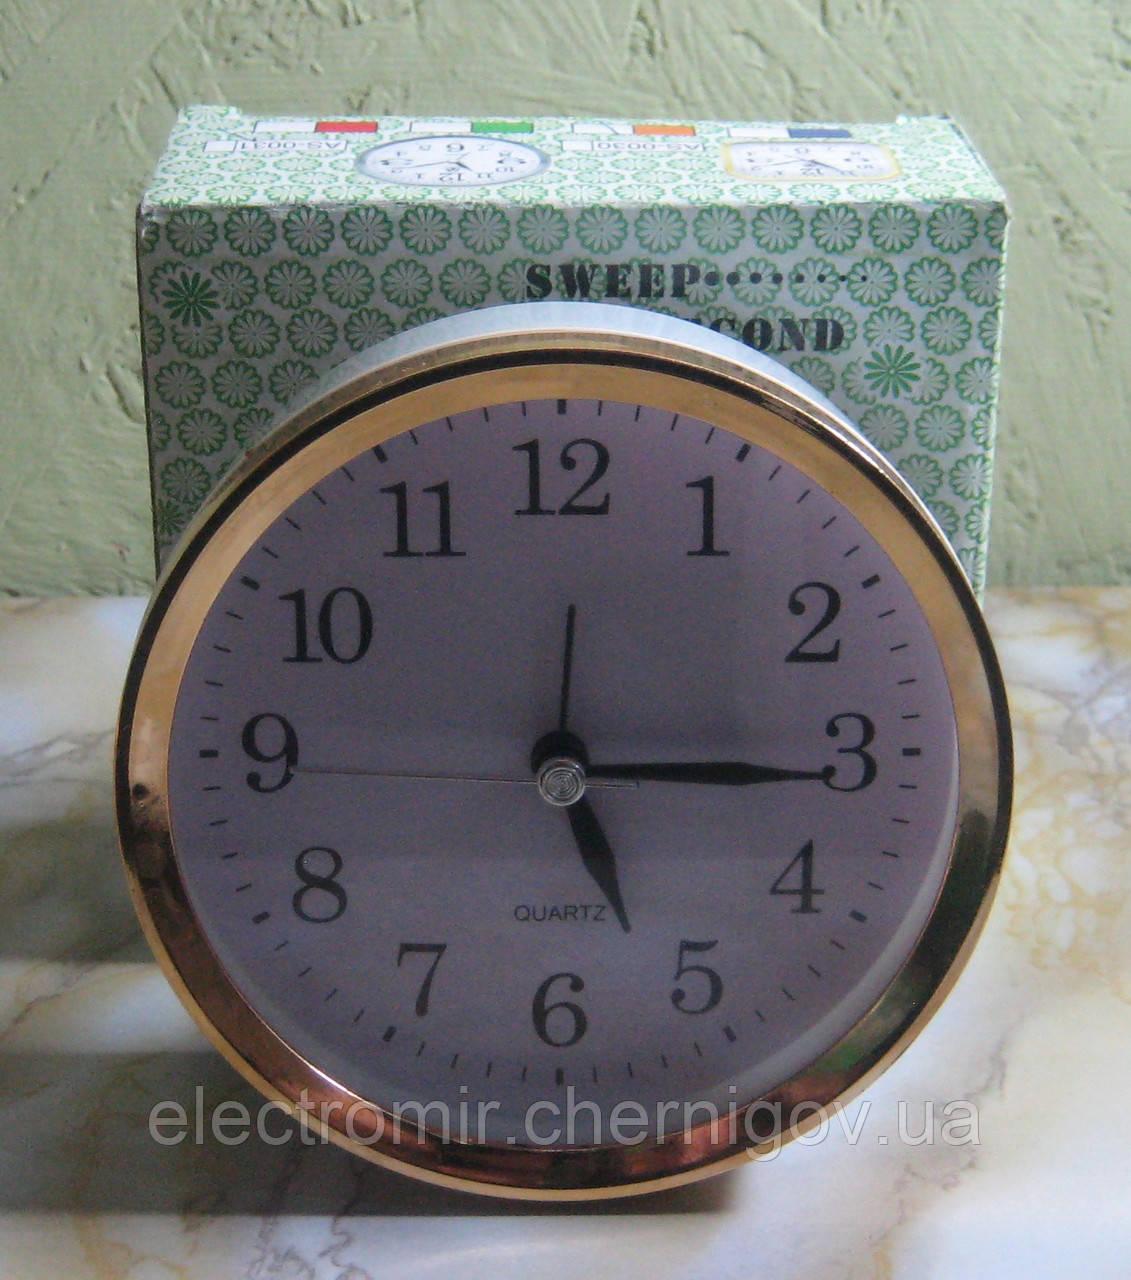 Часы настольные на батарейках AS-0031 (золотистые, 11 см диаметр)